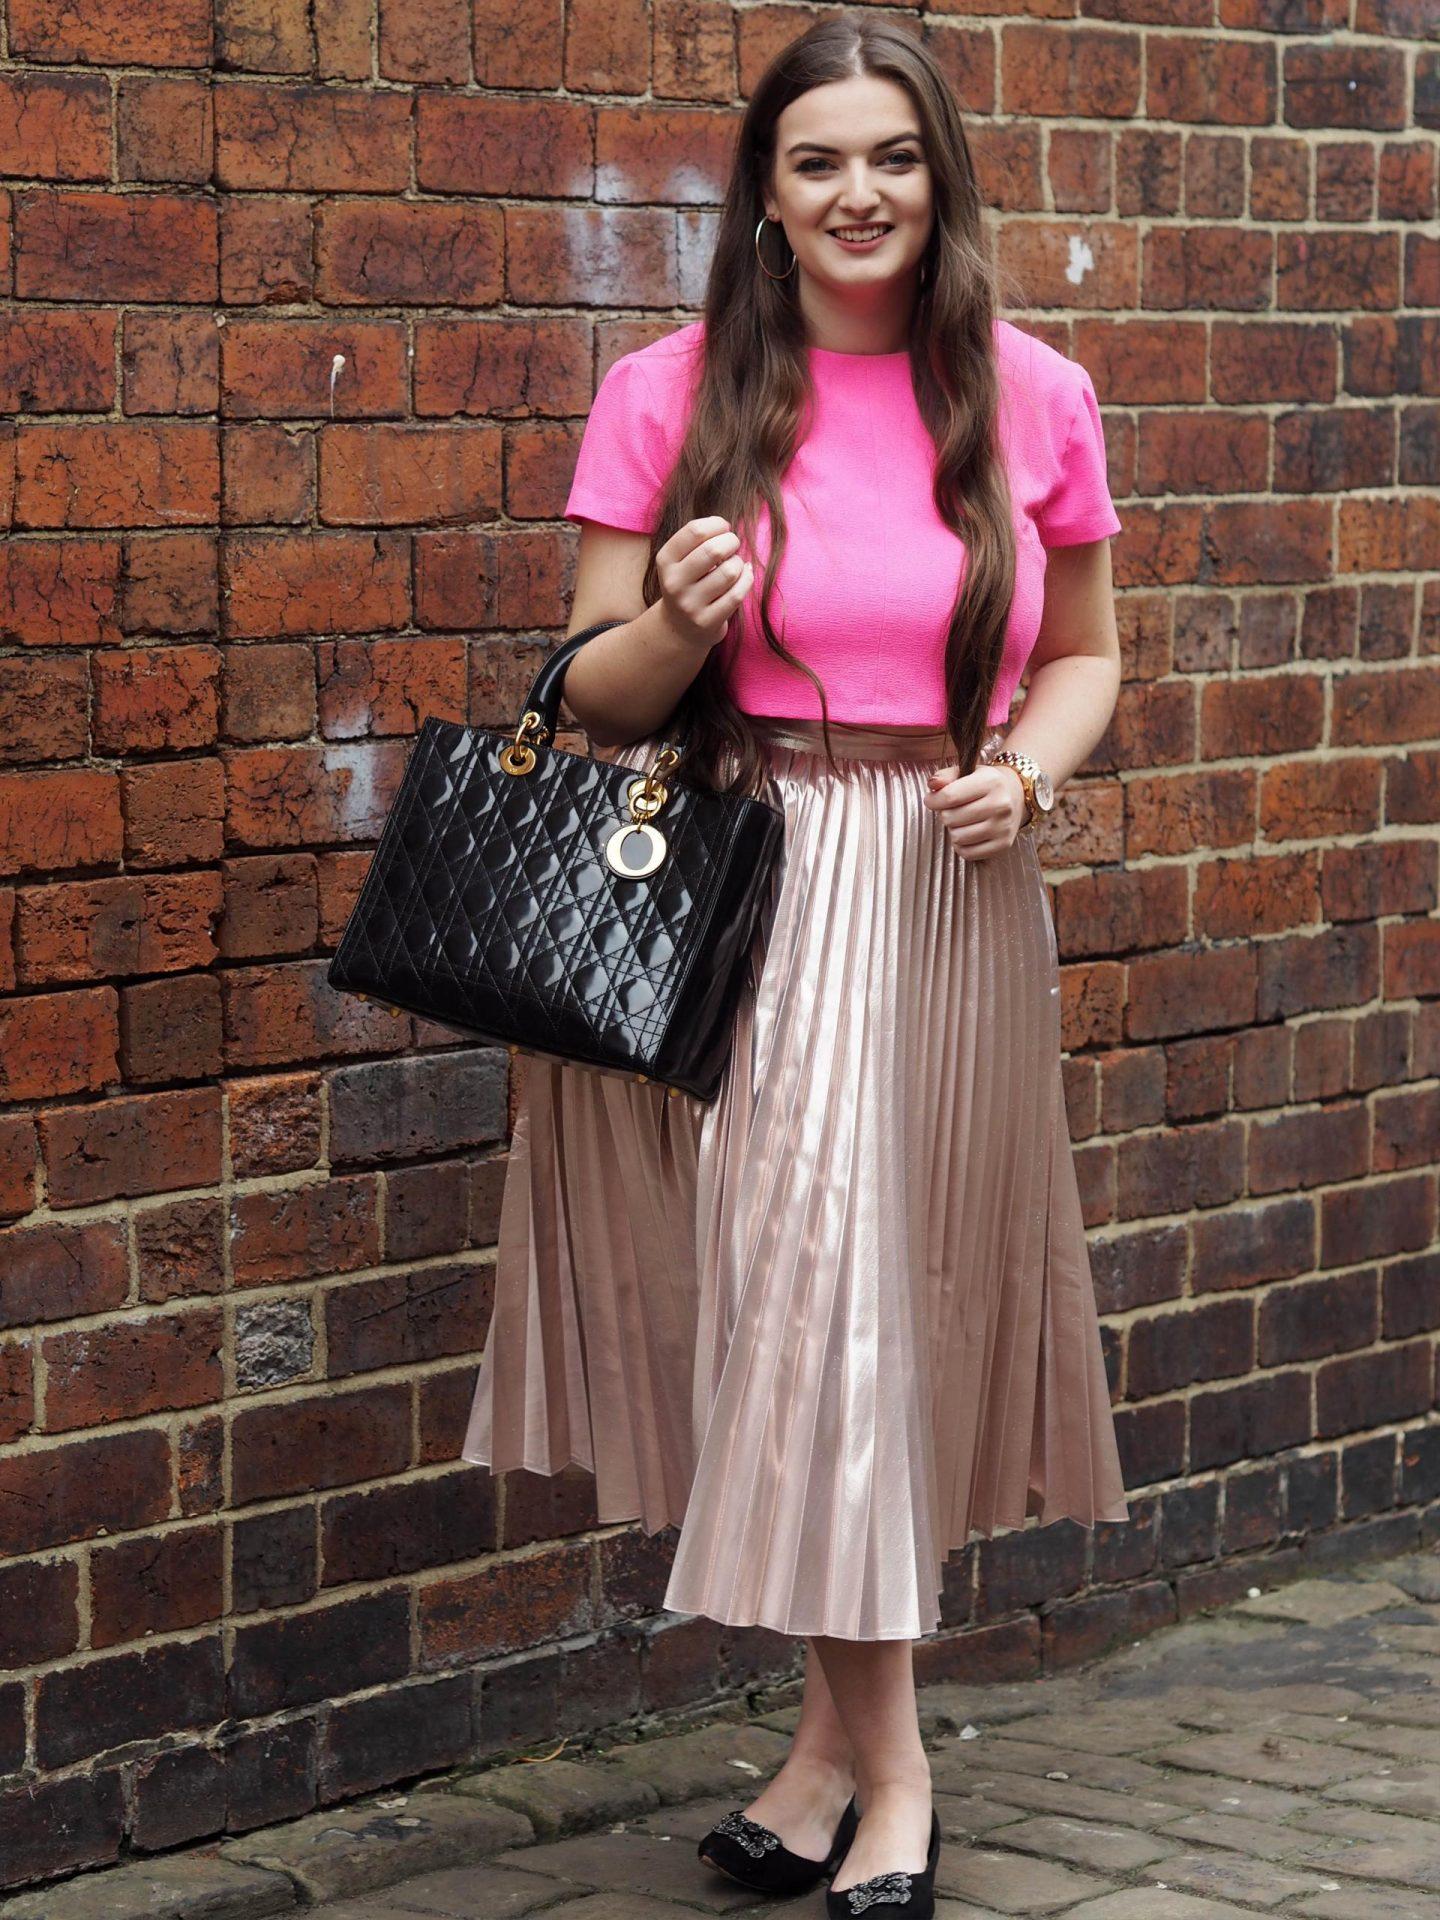 closet-london-pink-skirt-bloggers-blog-awards-2016-rachel-nicole-uk-blogger